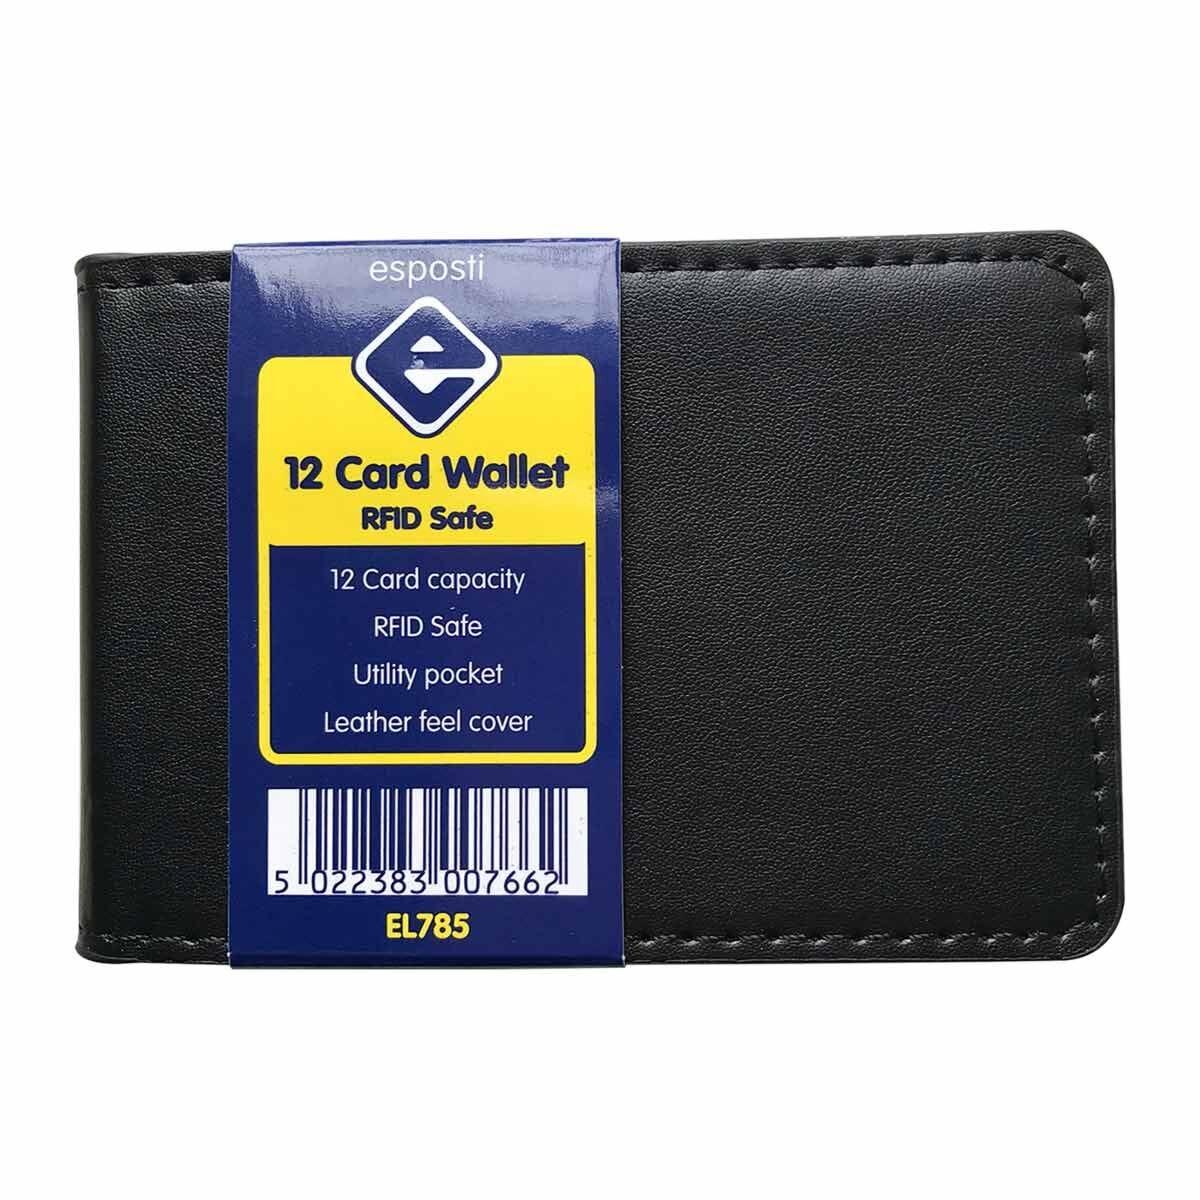 Esposti RFID Safe 12 Card Wallet